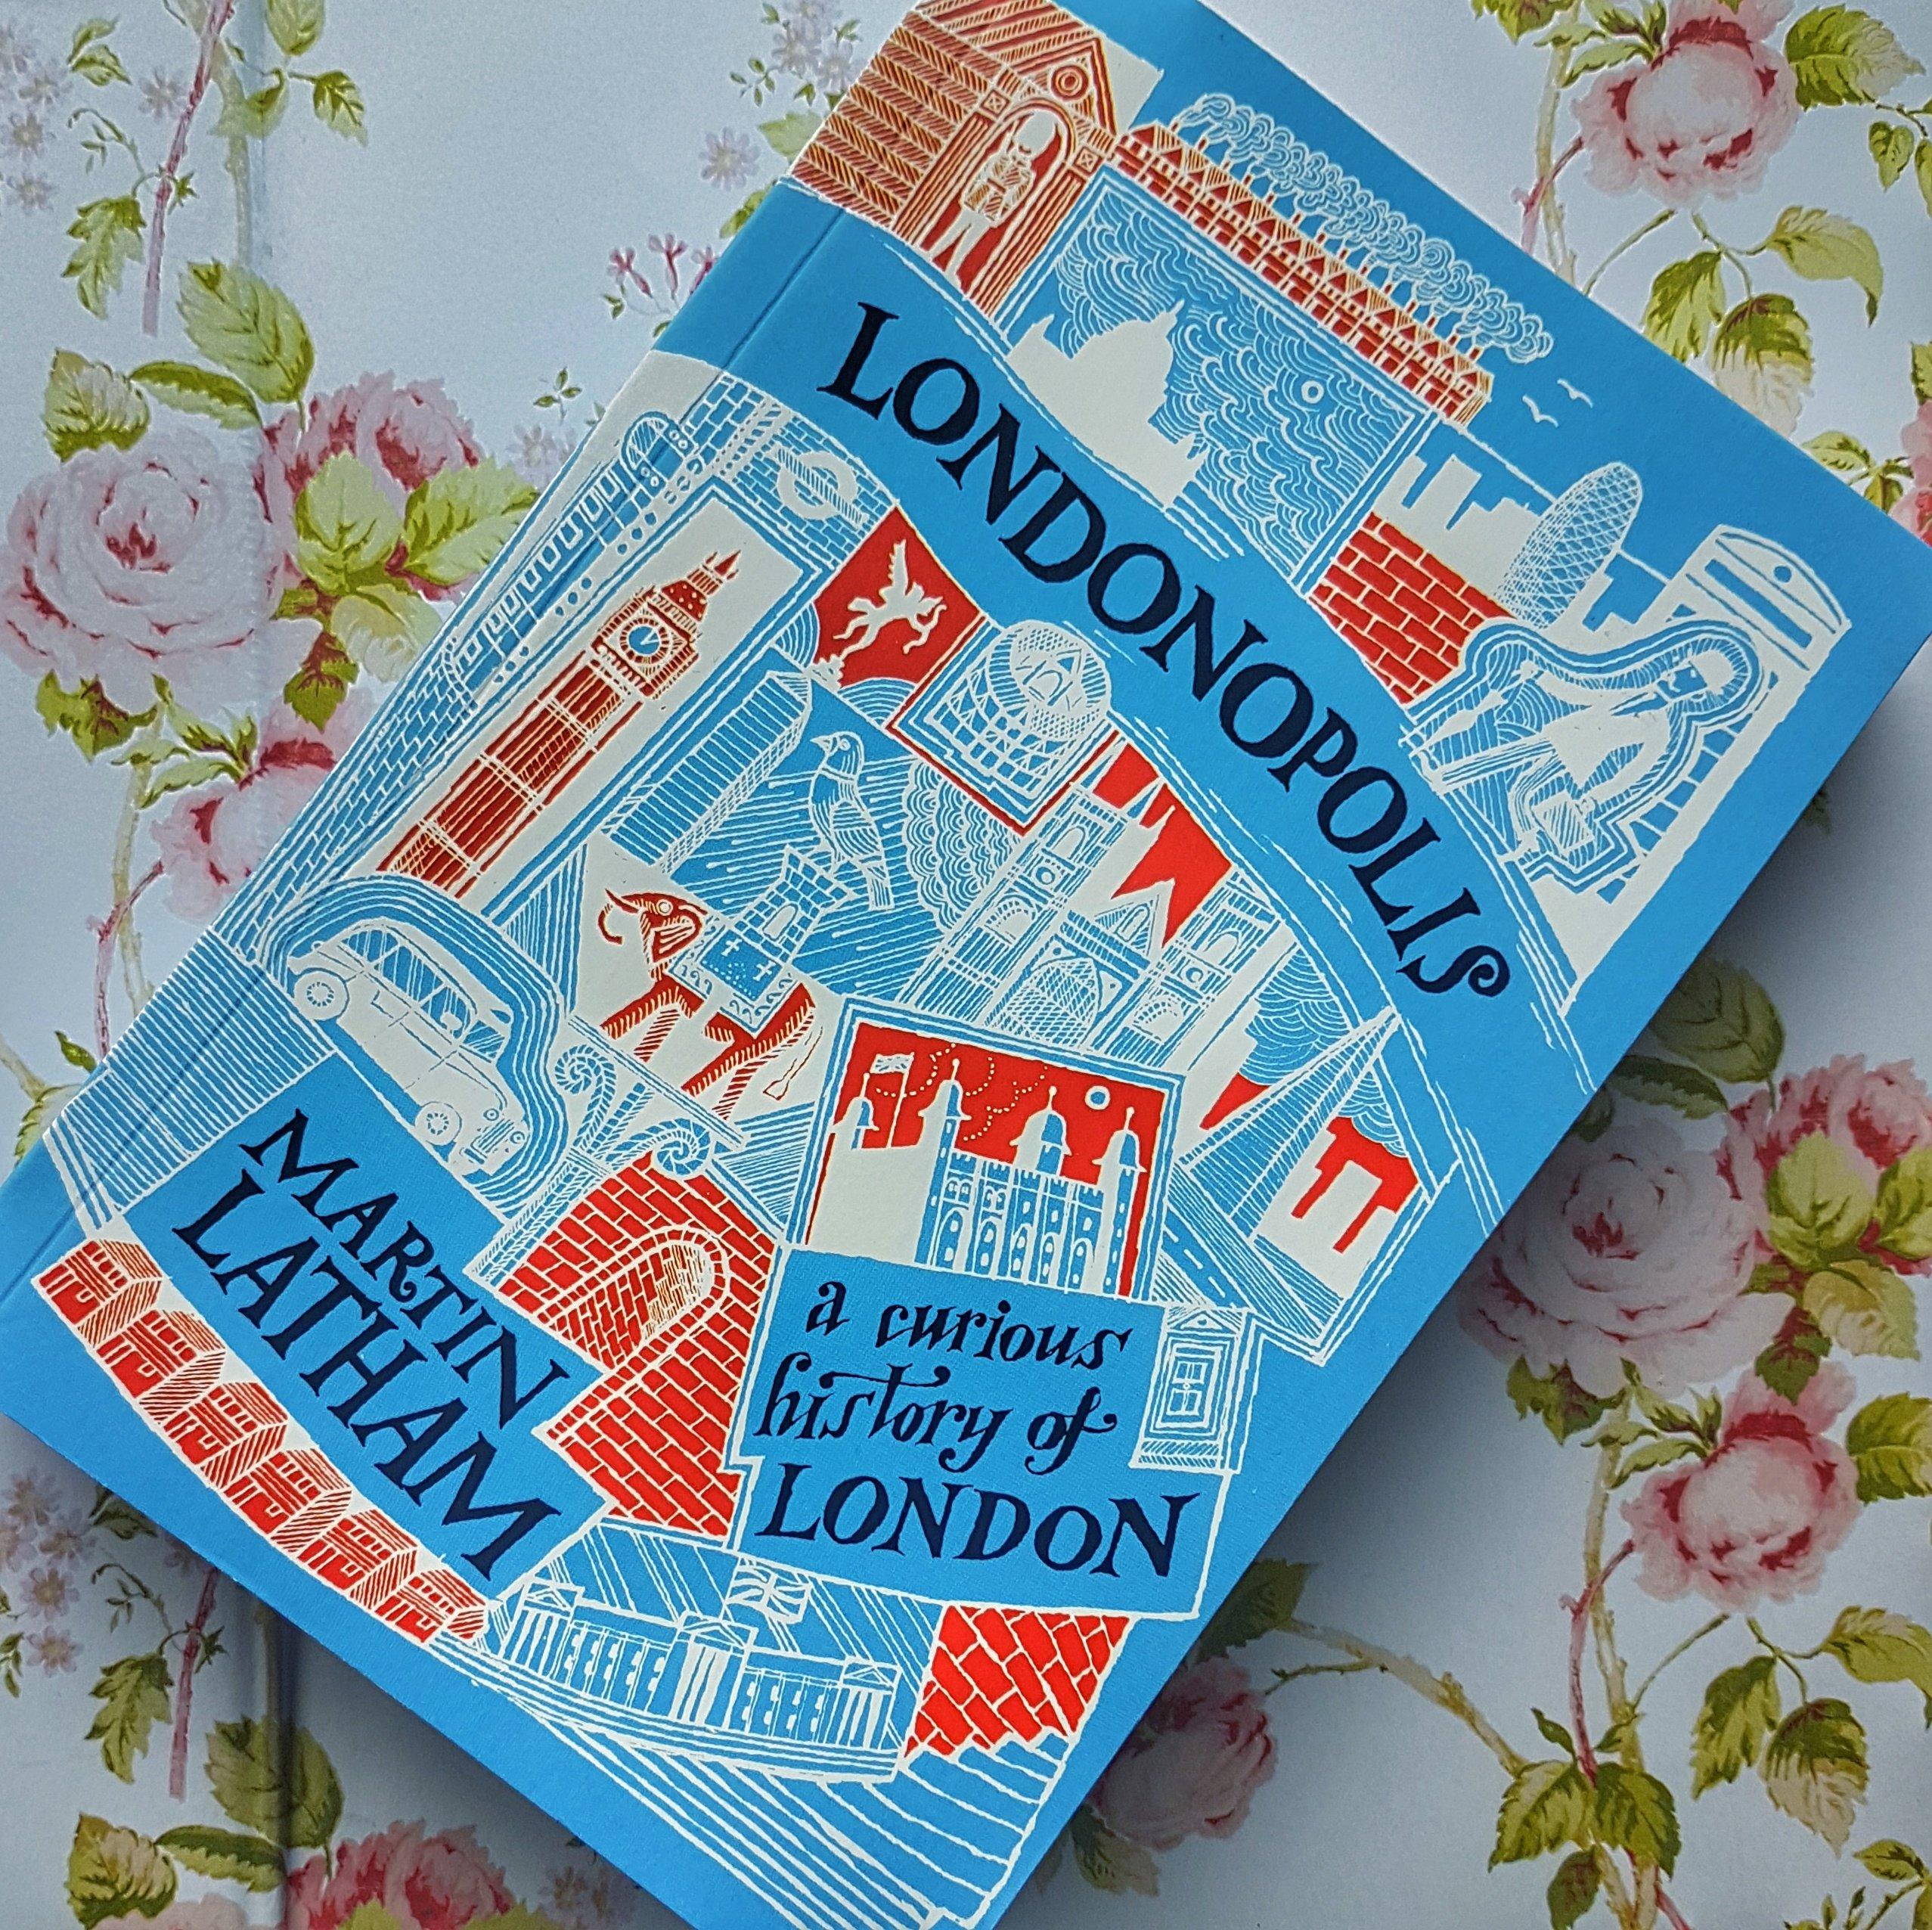 Londonopolis Reading Book